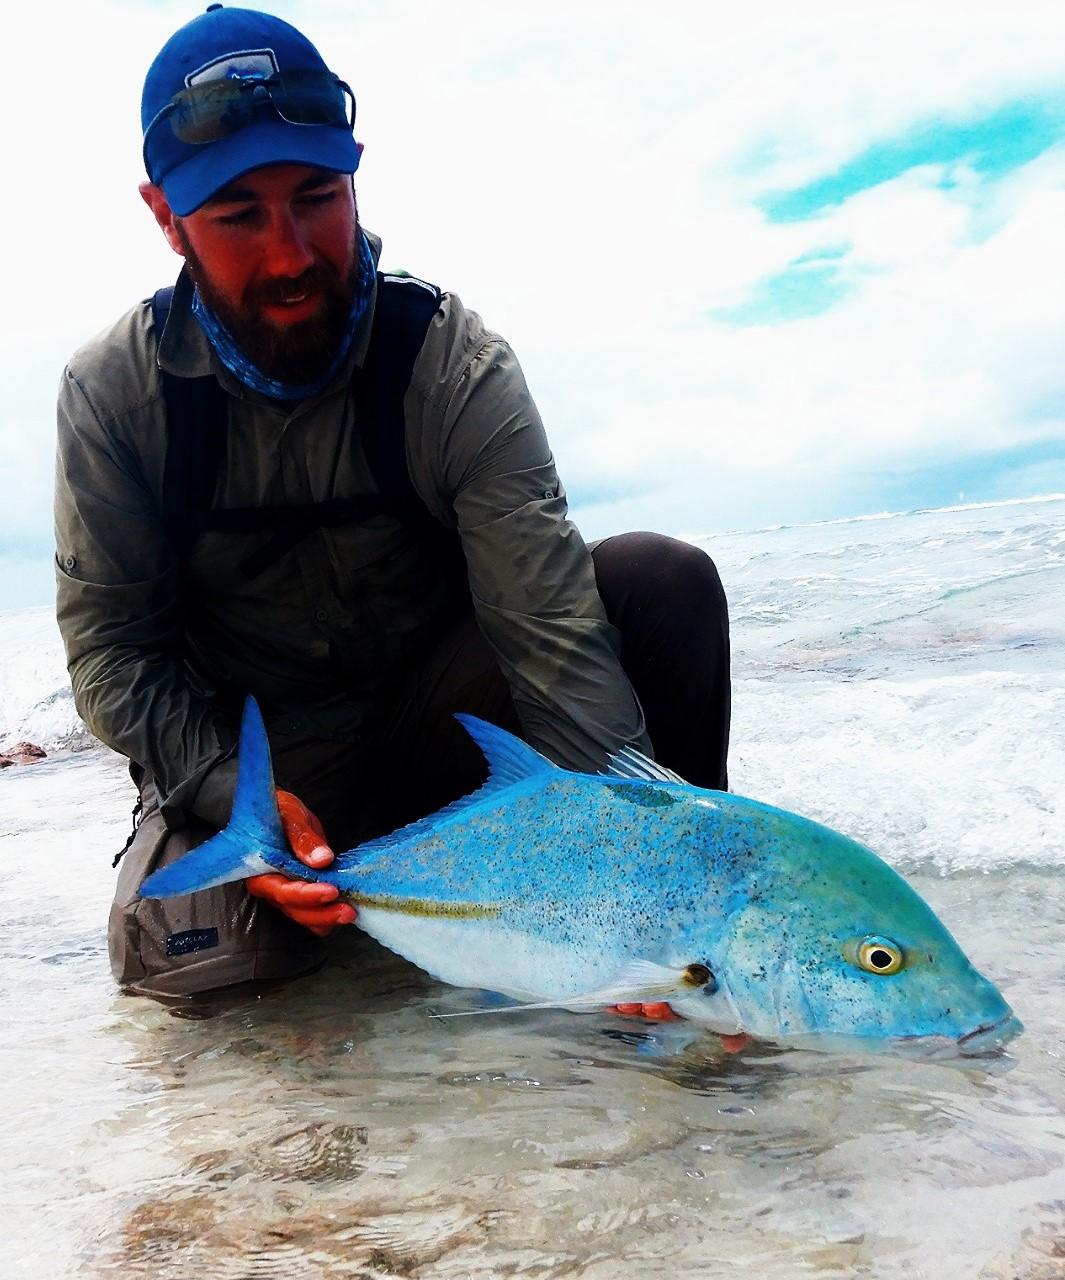 peche à la mouche sur Kiribati